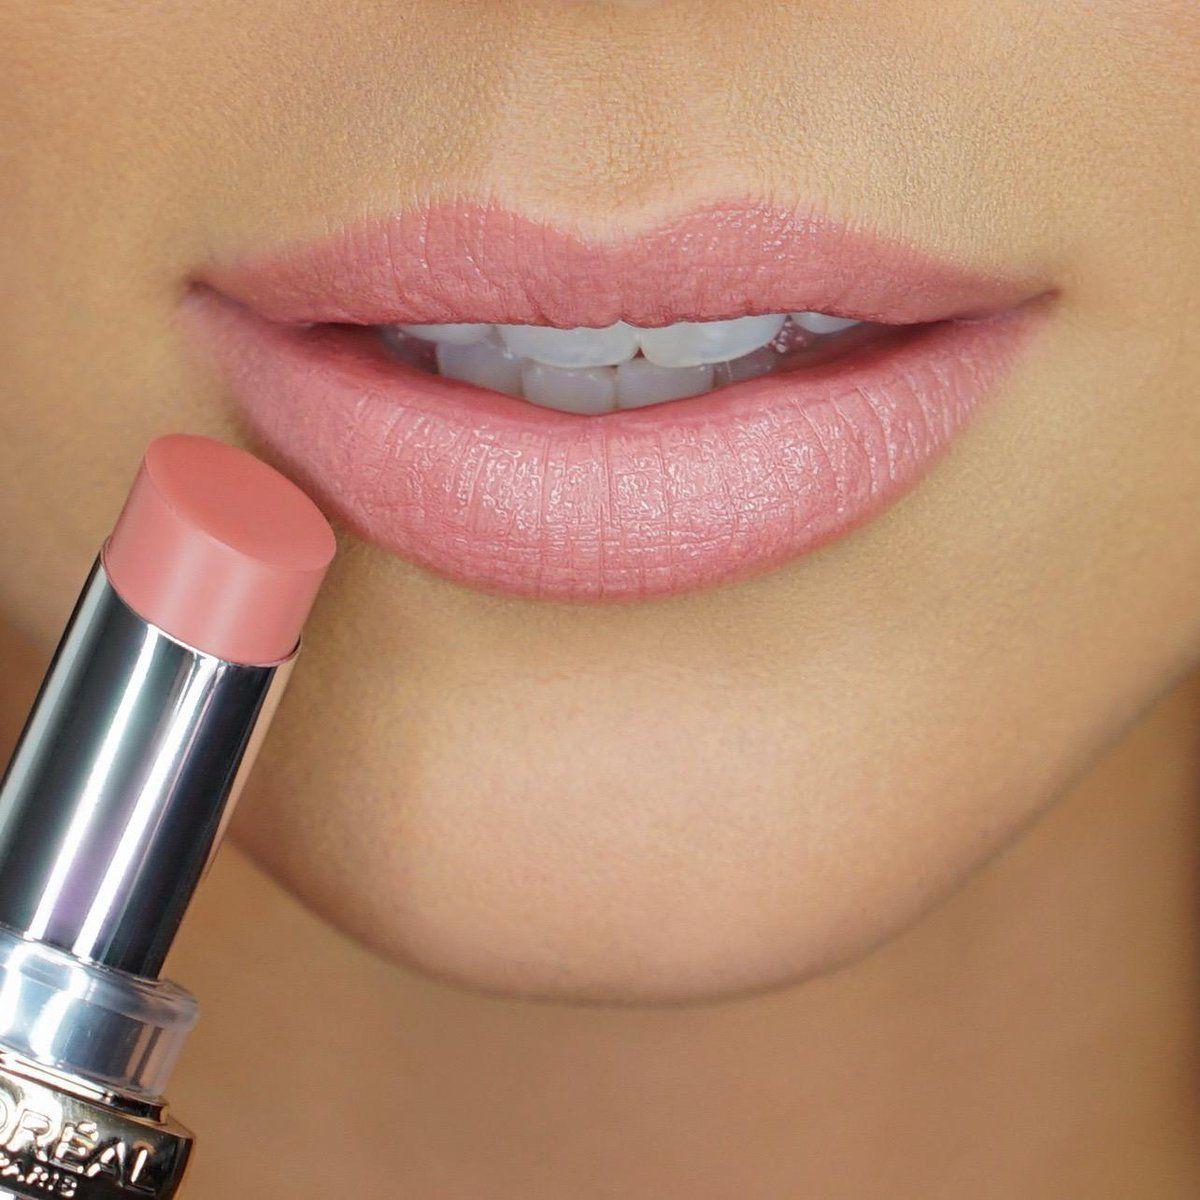 L'Oréal Paris Colour Riche Shine lipstick in shade 910 Sparkling Peach